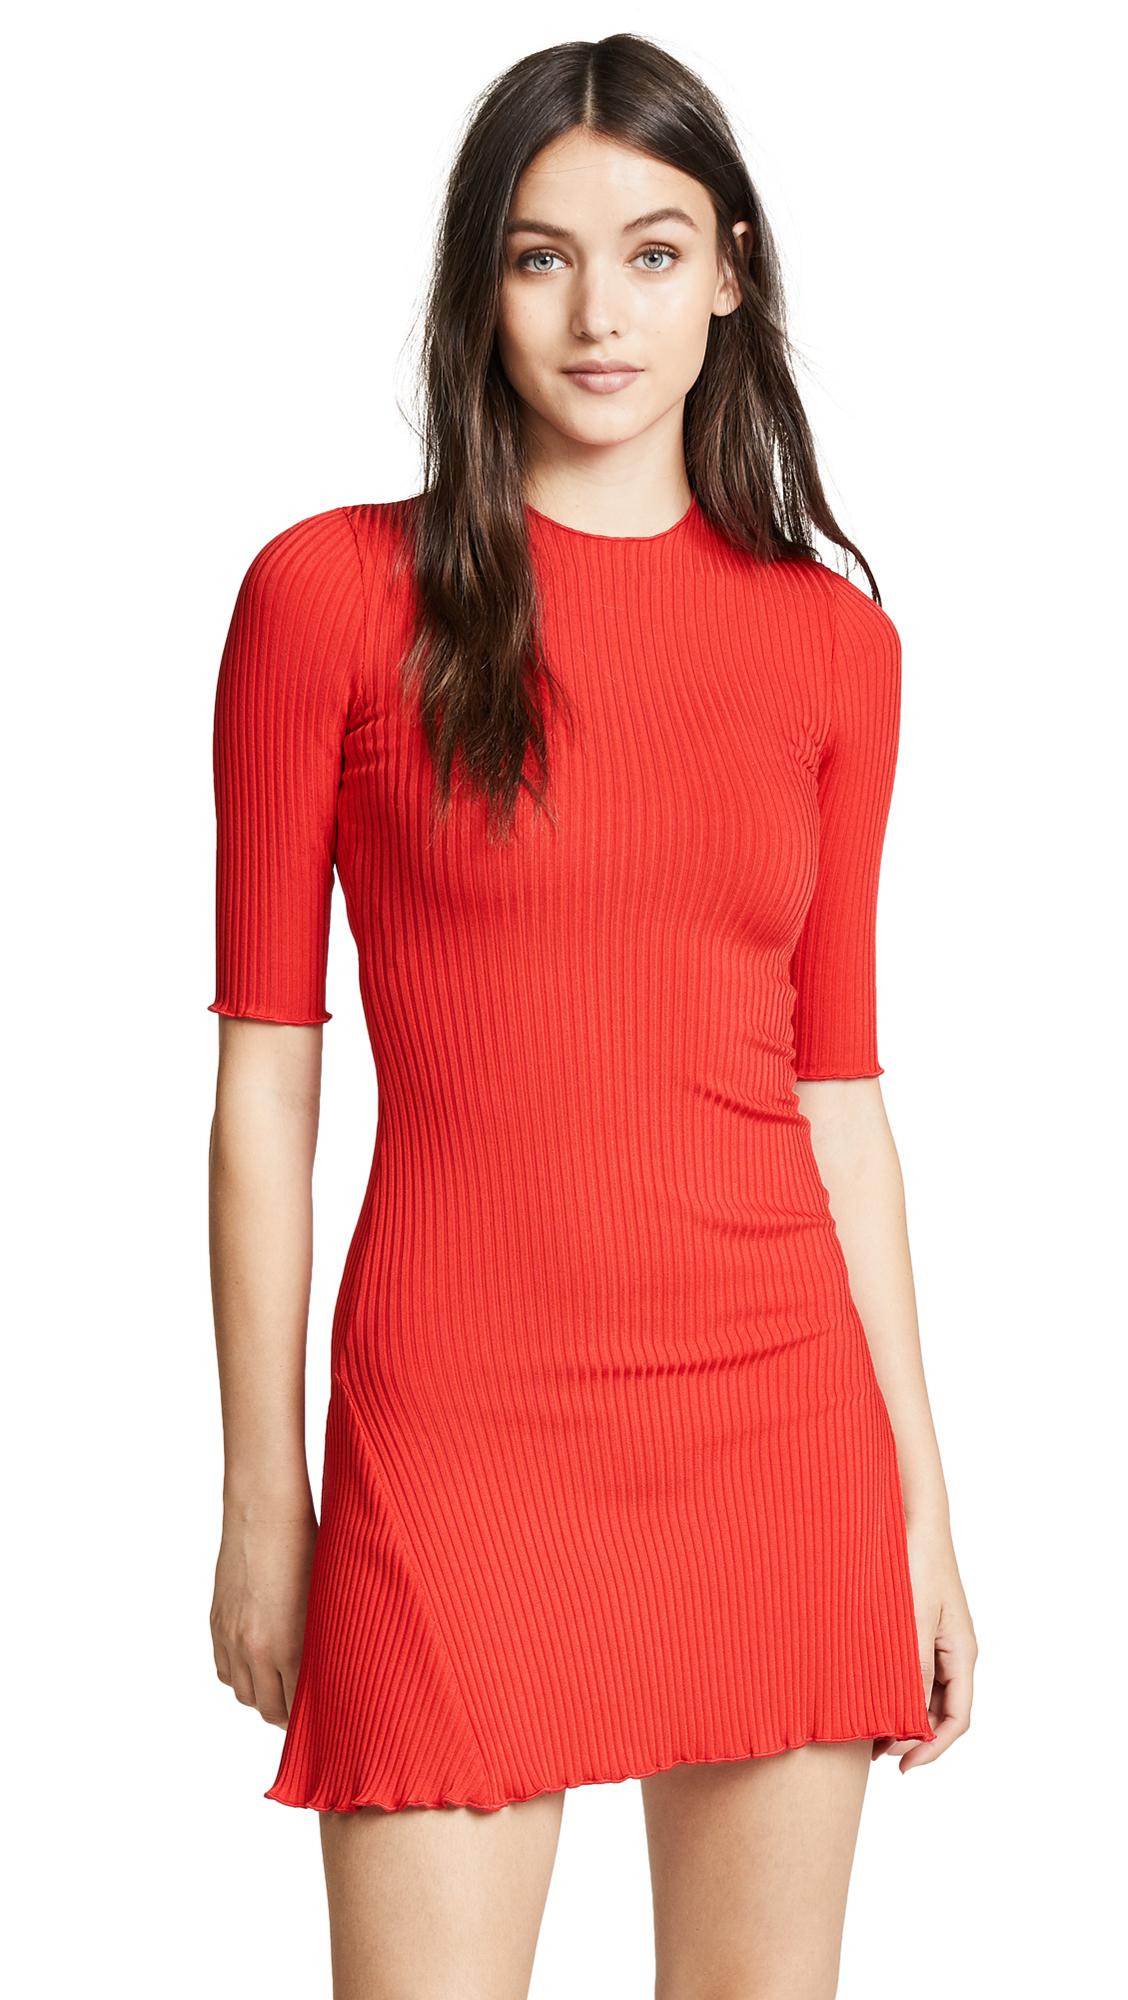 Bec & Bridge Babes Club Mini Dress